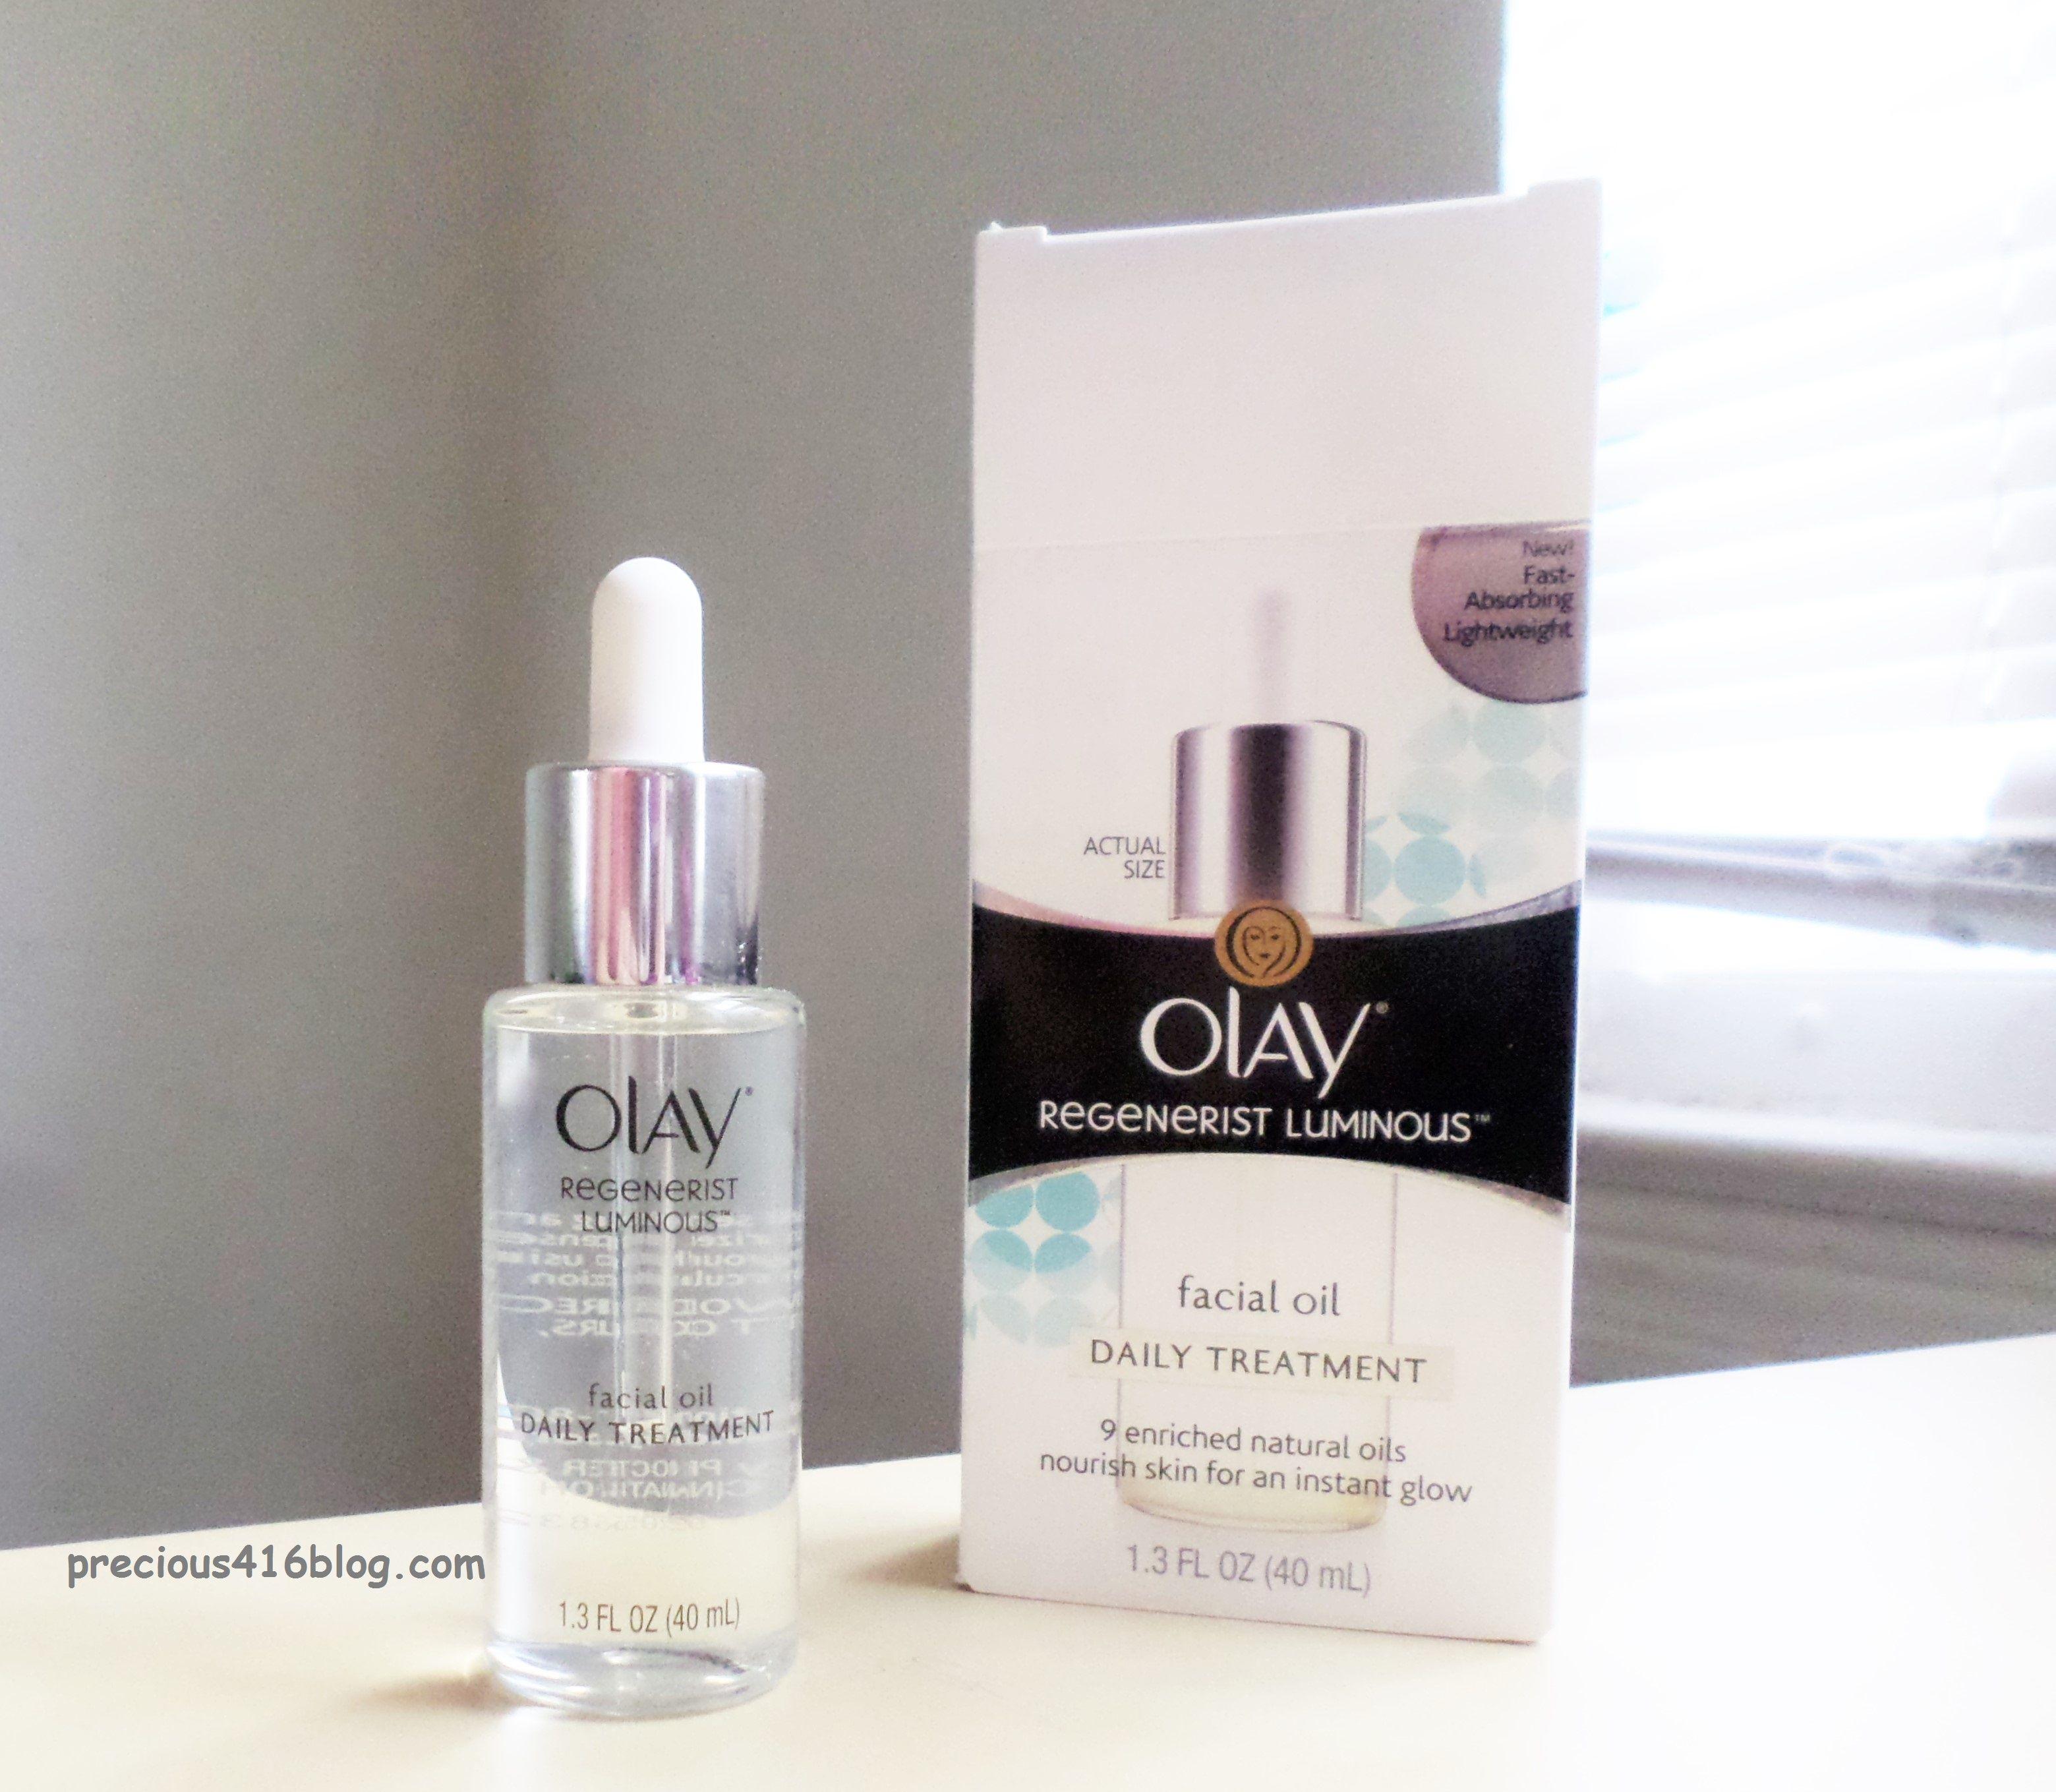 Olay Regenerist Luminous Facial Oil Review bbloggers